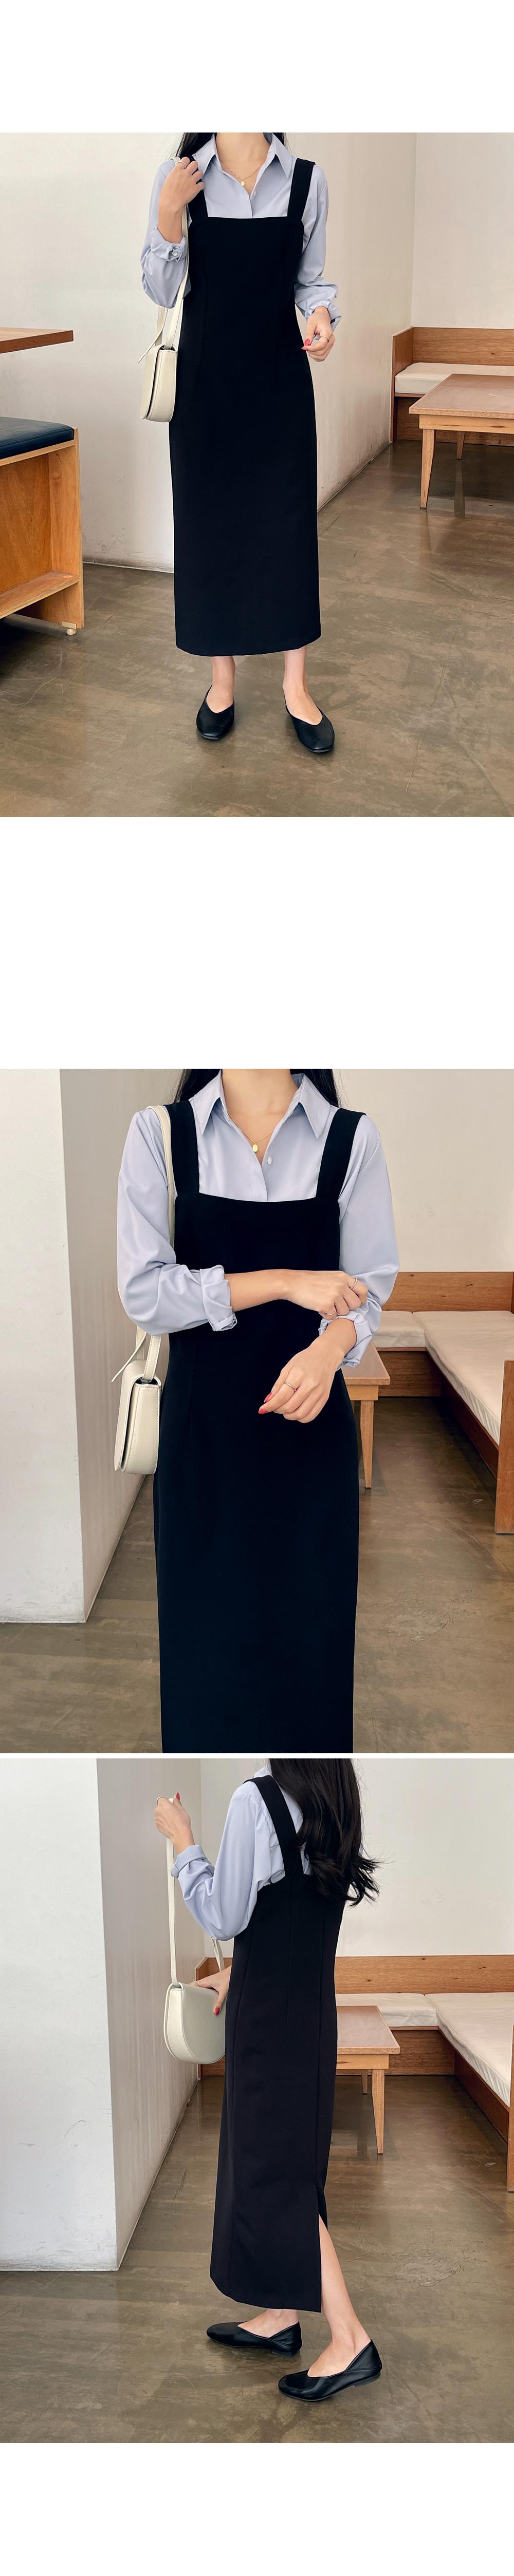 Square Neck Layered Long Dress-holiholic.com